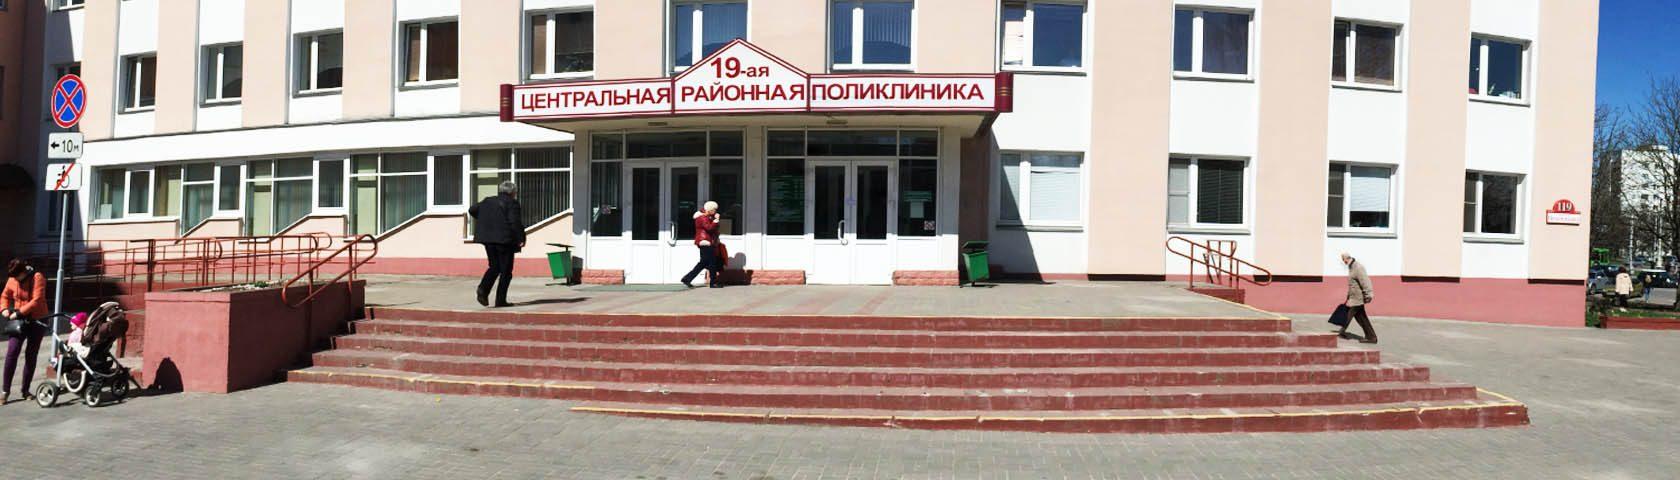 Калганская центральная районная больница инн